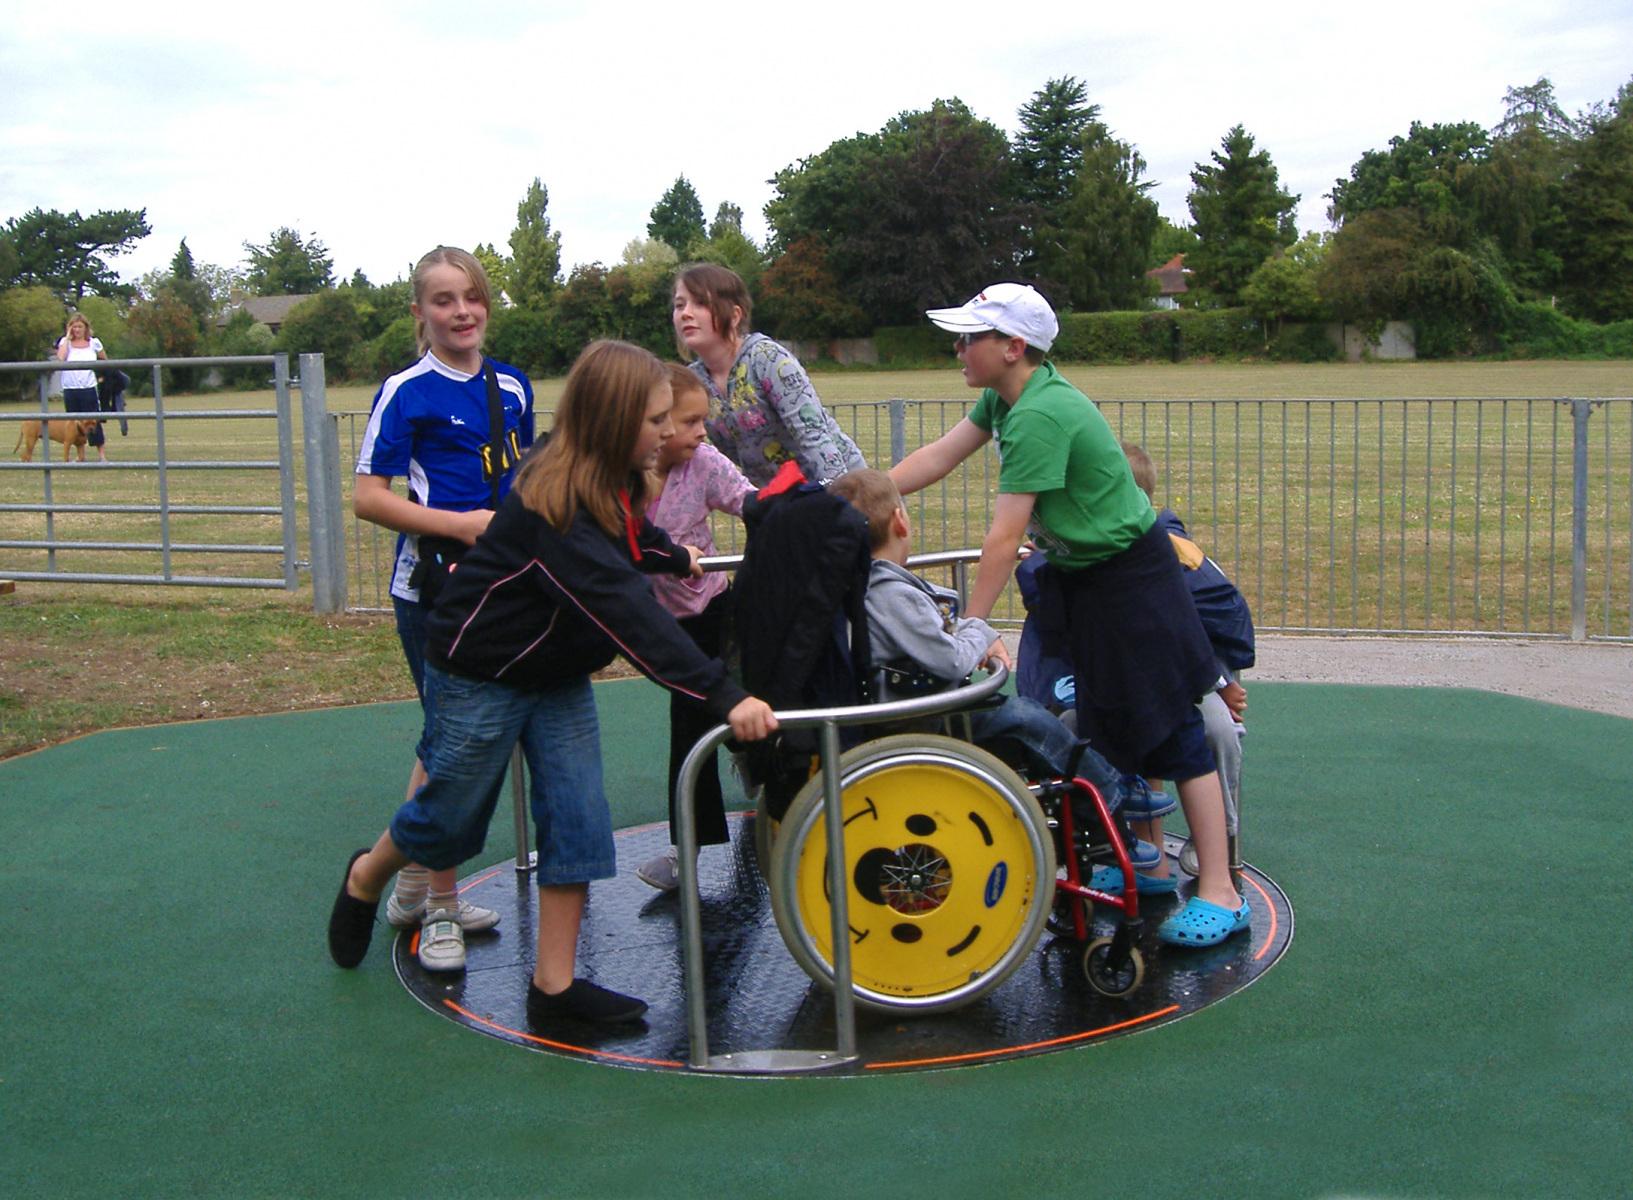 inclusive-orbit-park-wetpour-06